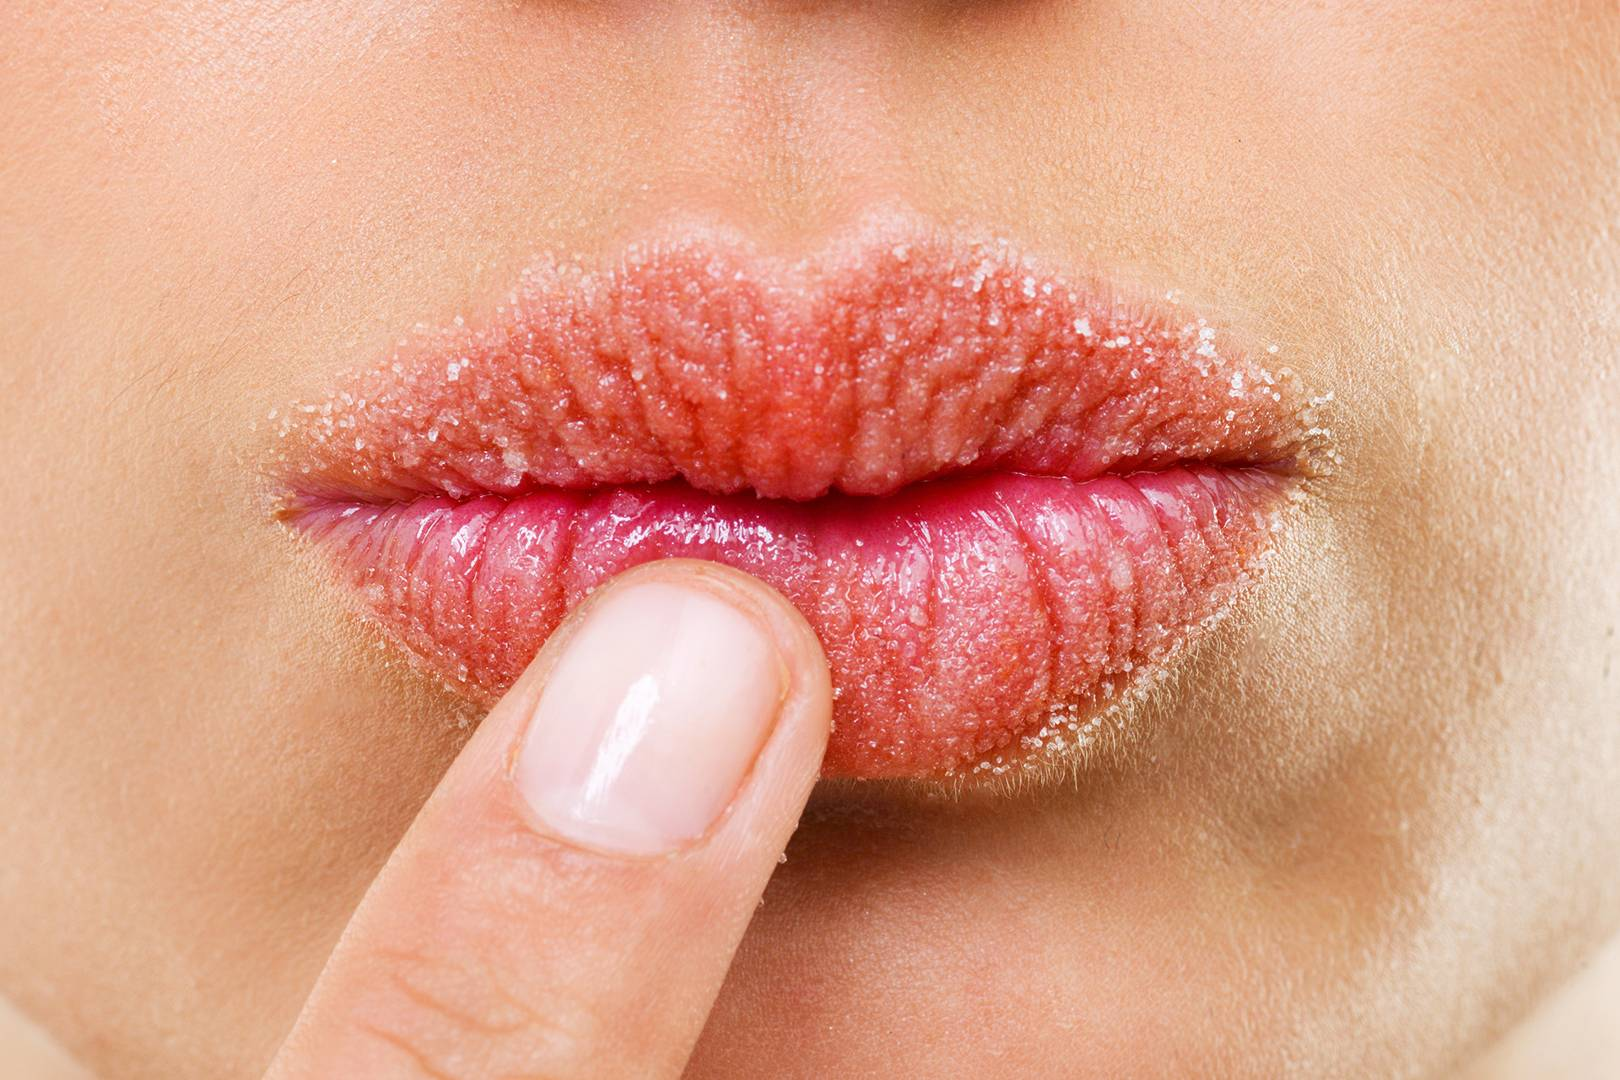 lips glamour 5feb18 istock 506132985 l